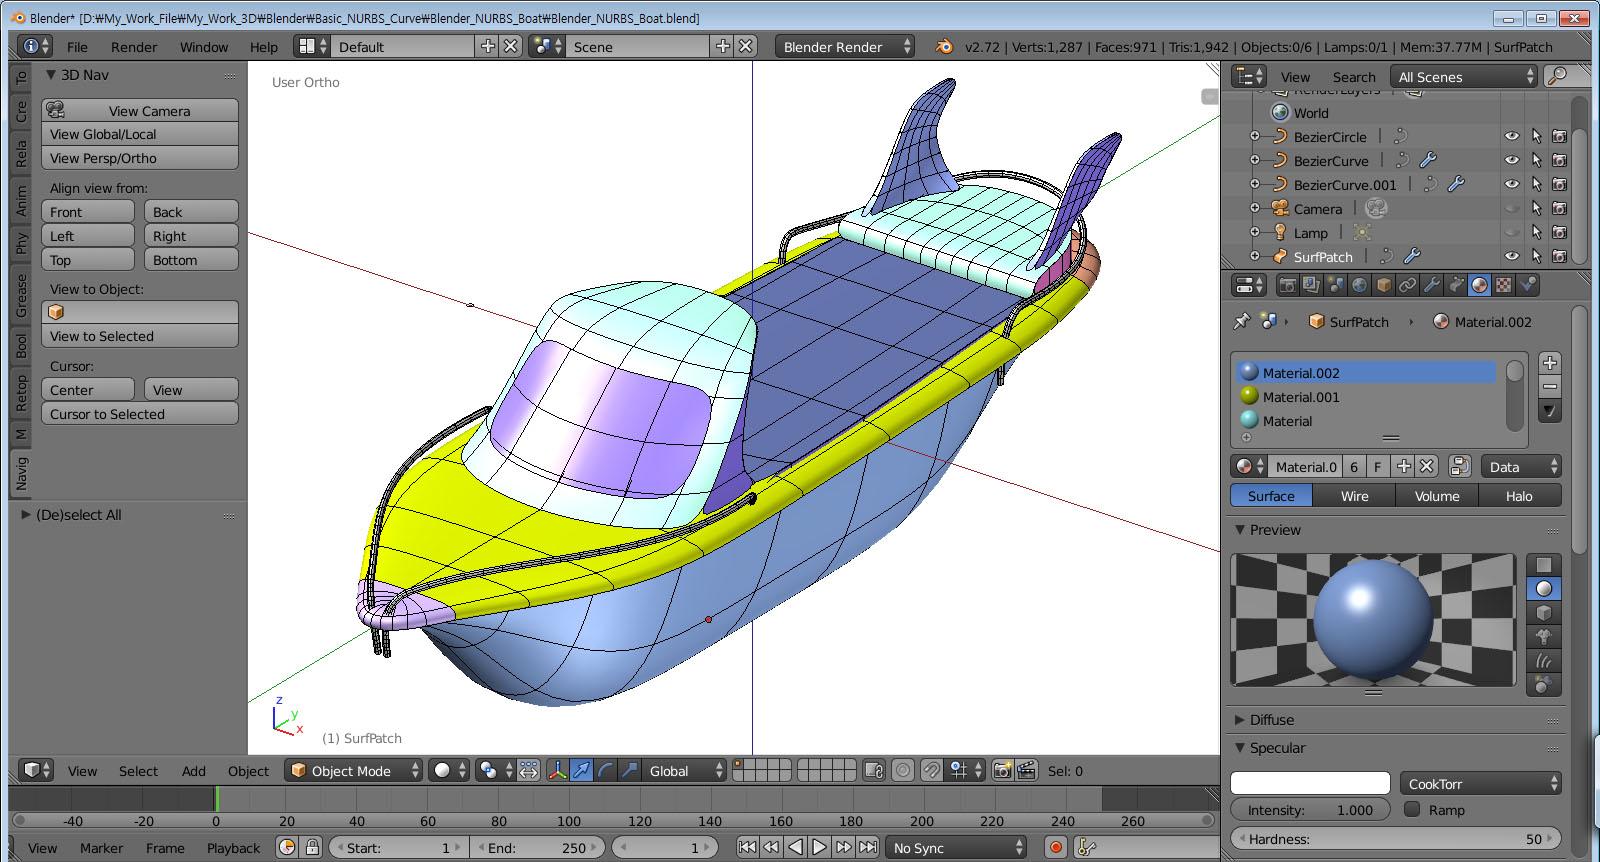 Korea3D: Blender 2.72b NURBS Surface + Boolean Modeling Test